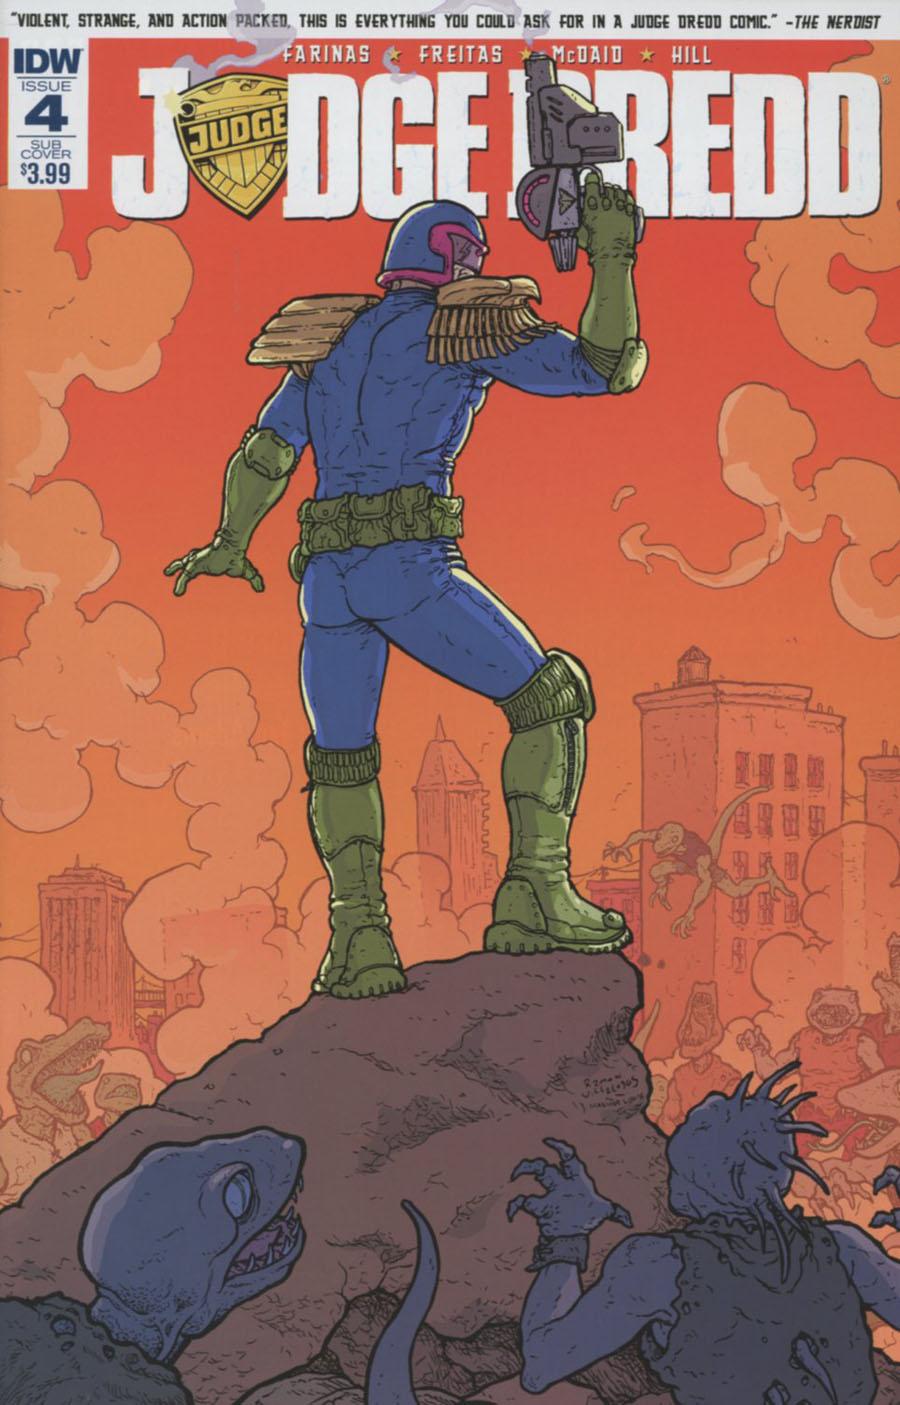 Judge Dredd Vol 5 #4 Cover B Variant Ramon Villalobos Subscription Cover